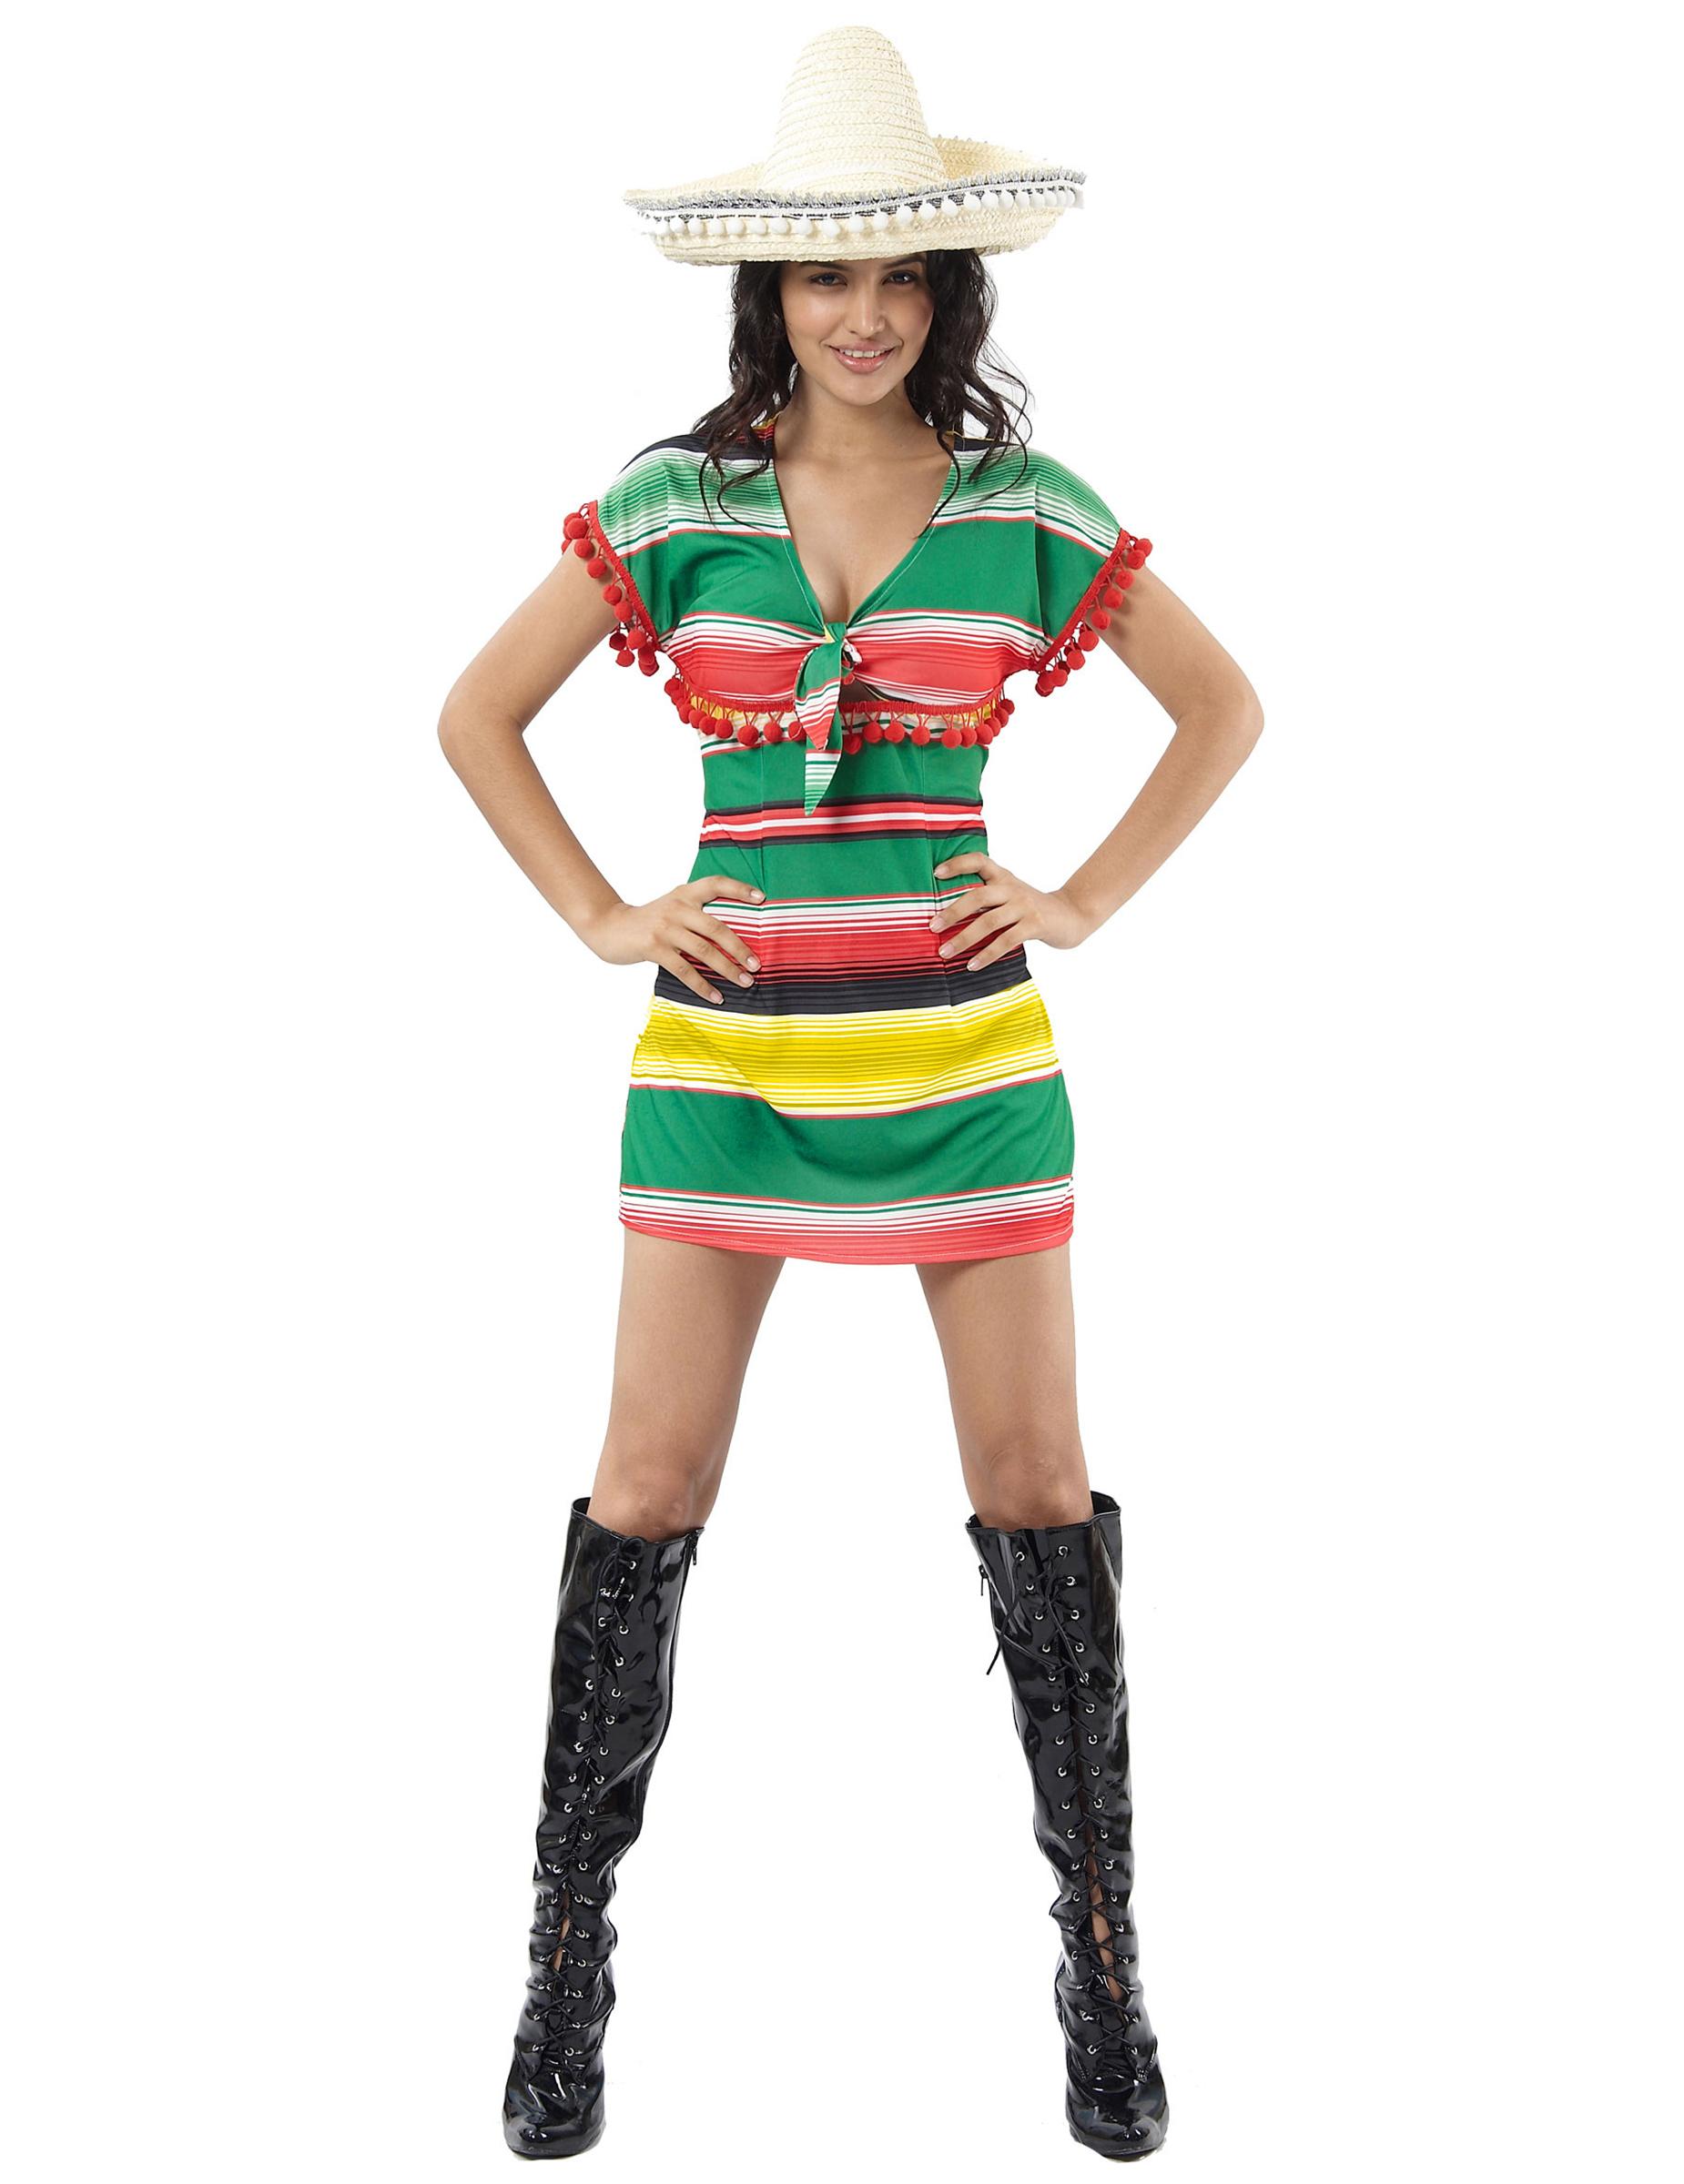 Costume messicana donna  Costumi adulti f932d45dfb72